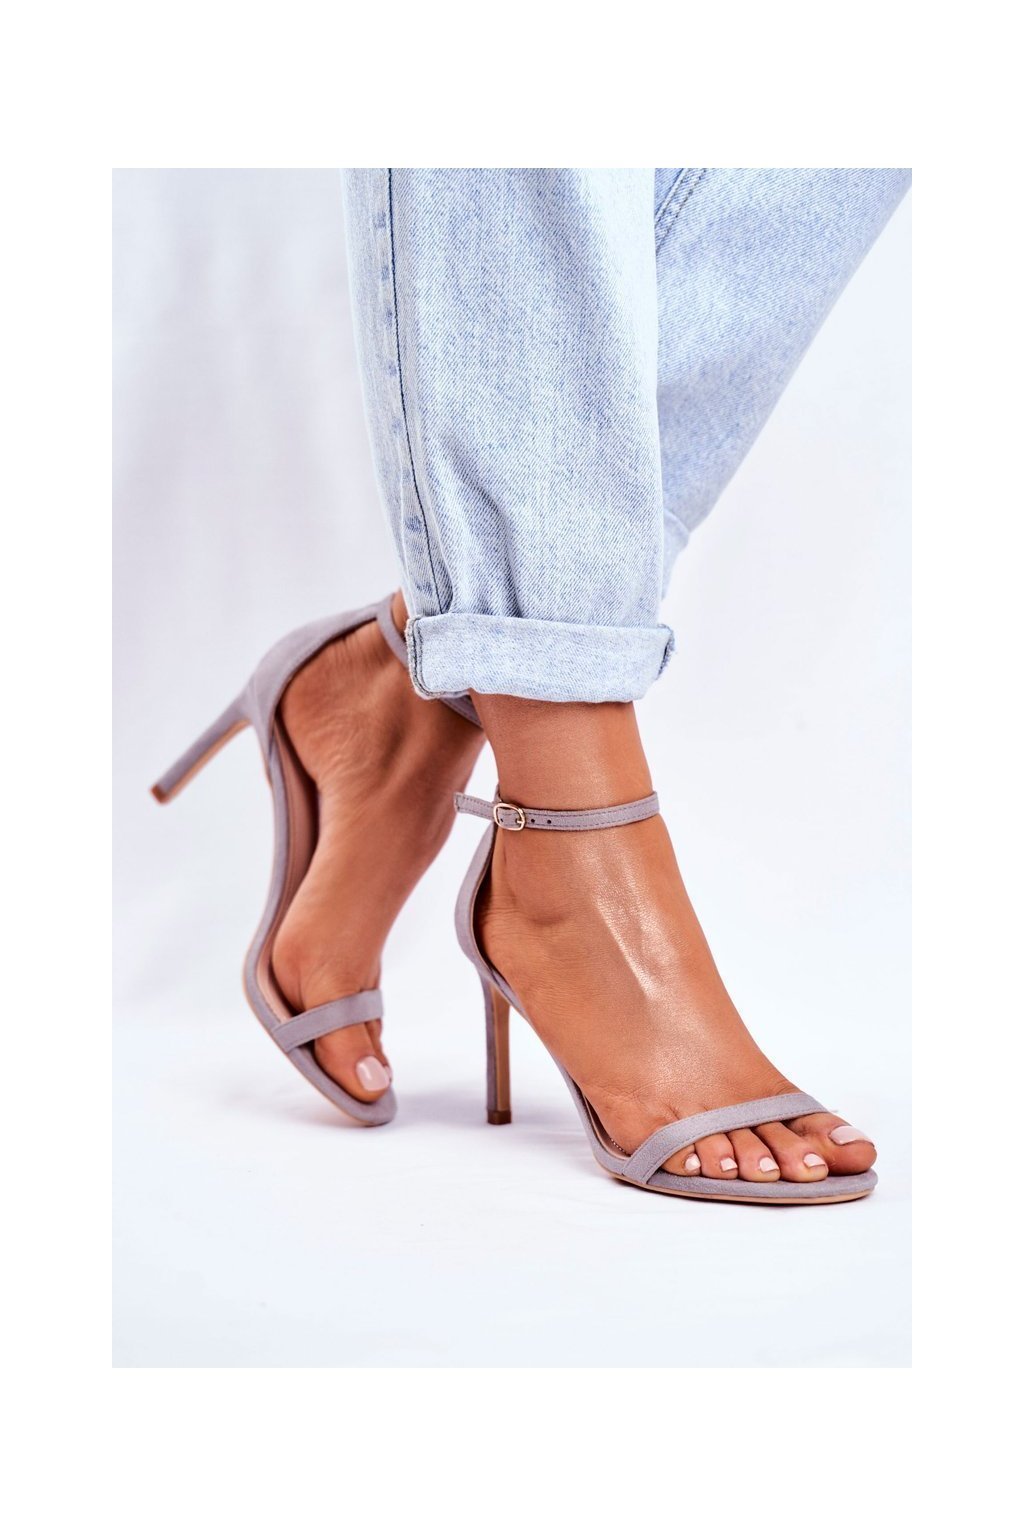 Dámske sandále na podpätku farba sivá kód obuvi NF31 GREY